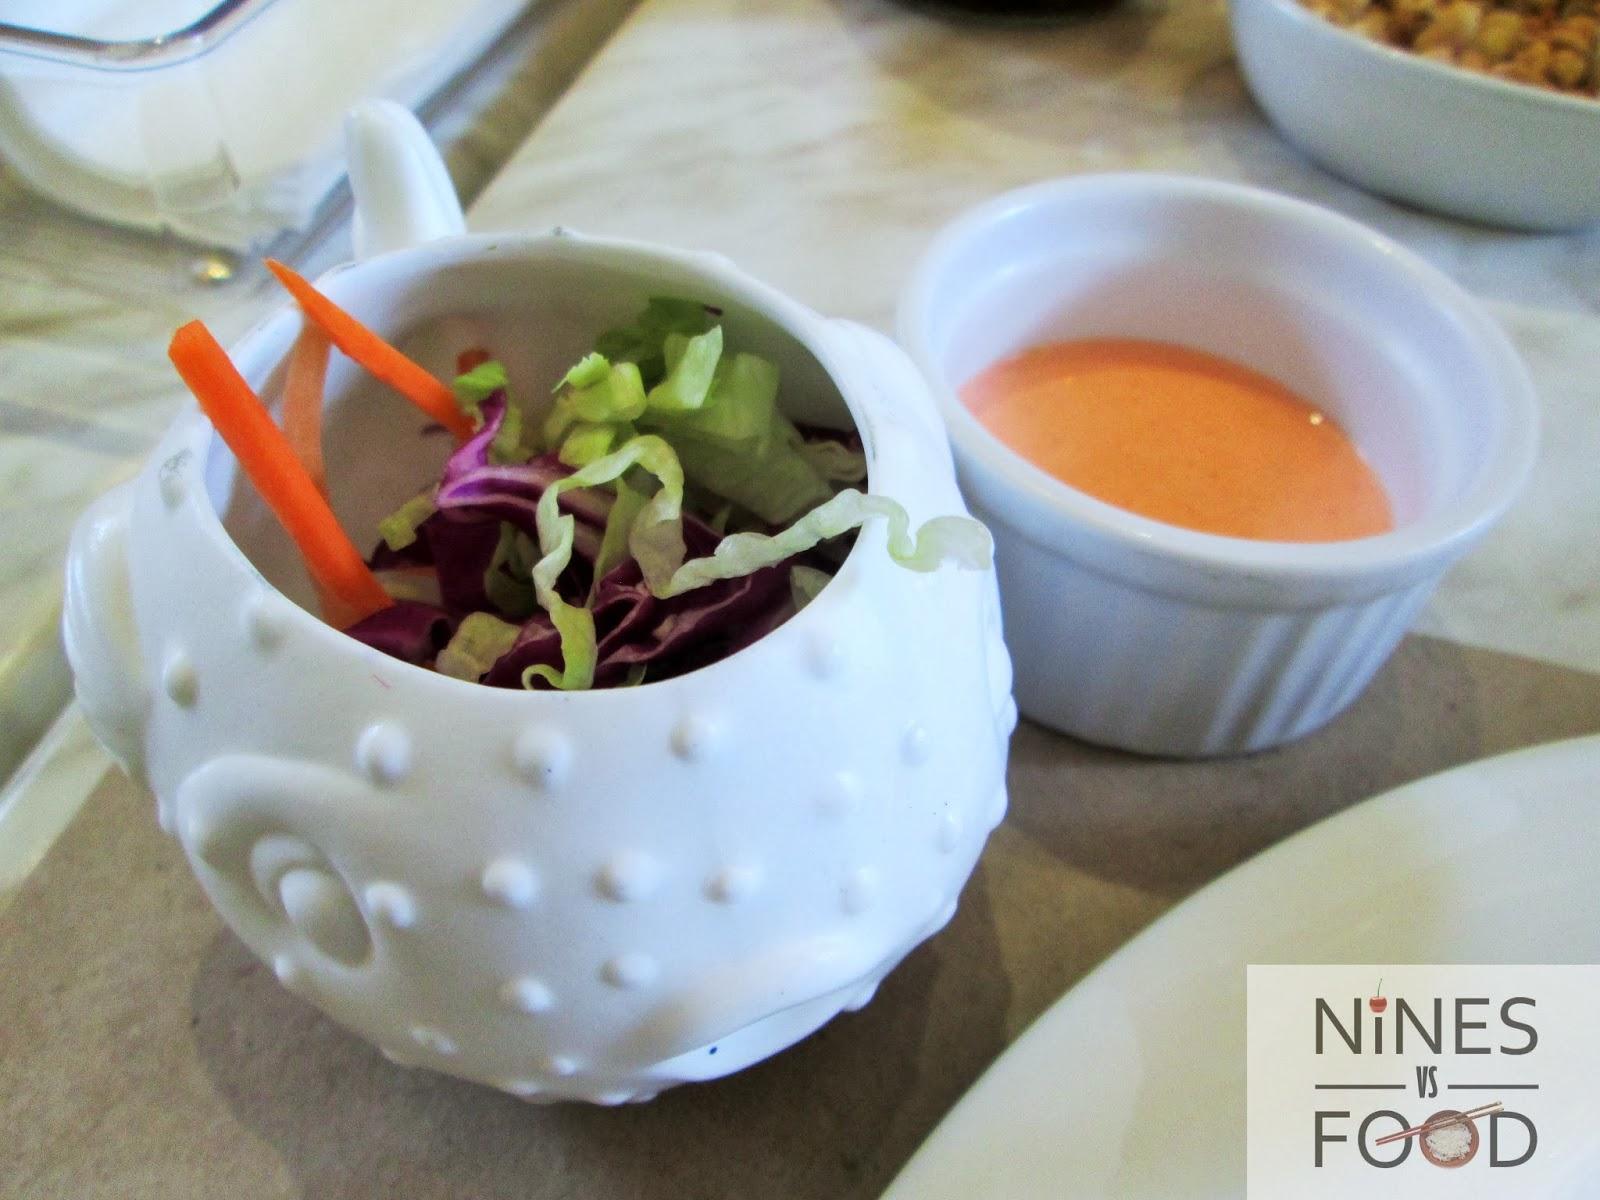 Nines vs. Food - B&P Shaw Mandaluyong-15.jpg